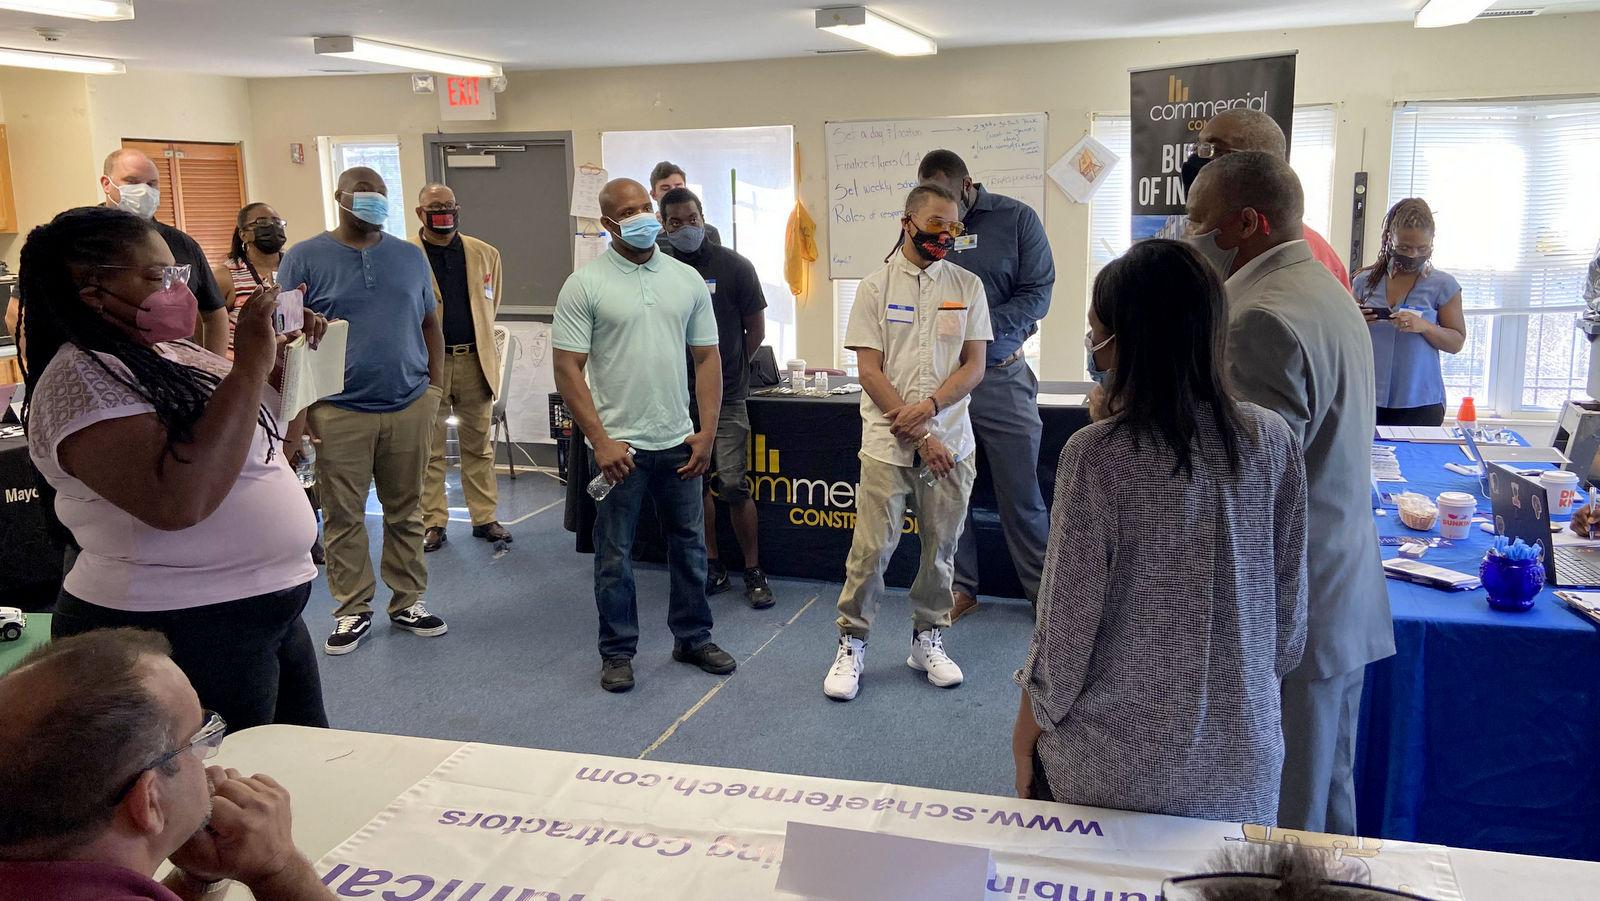 Organizers of a recent neighborhood job fair, the Pilmlico Terrace Neighborhood Association, address participants. (Timothy Dashiell)